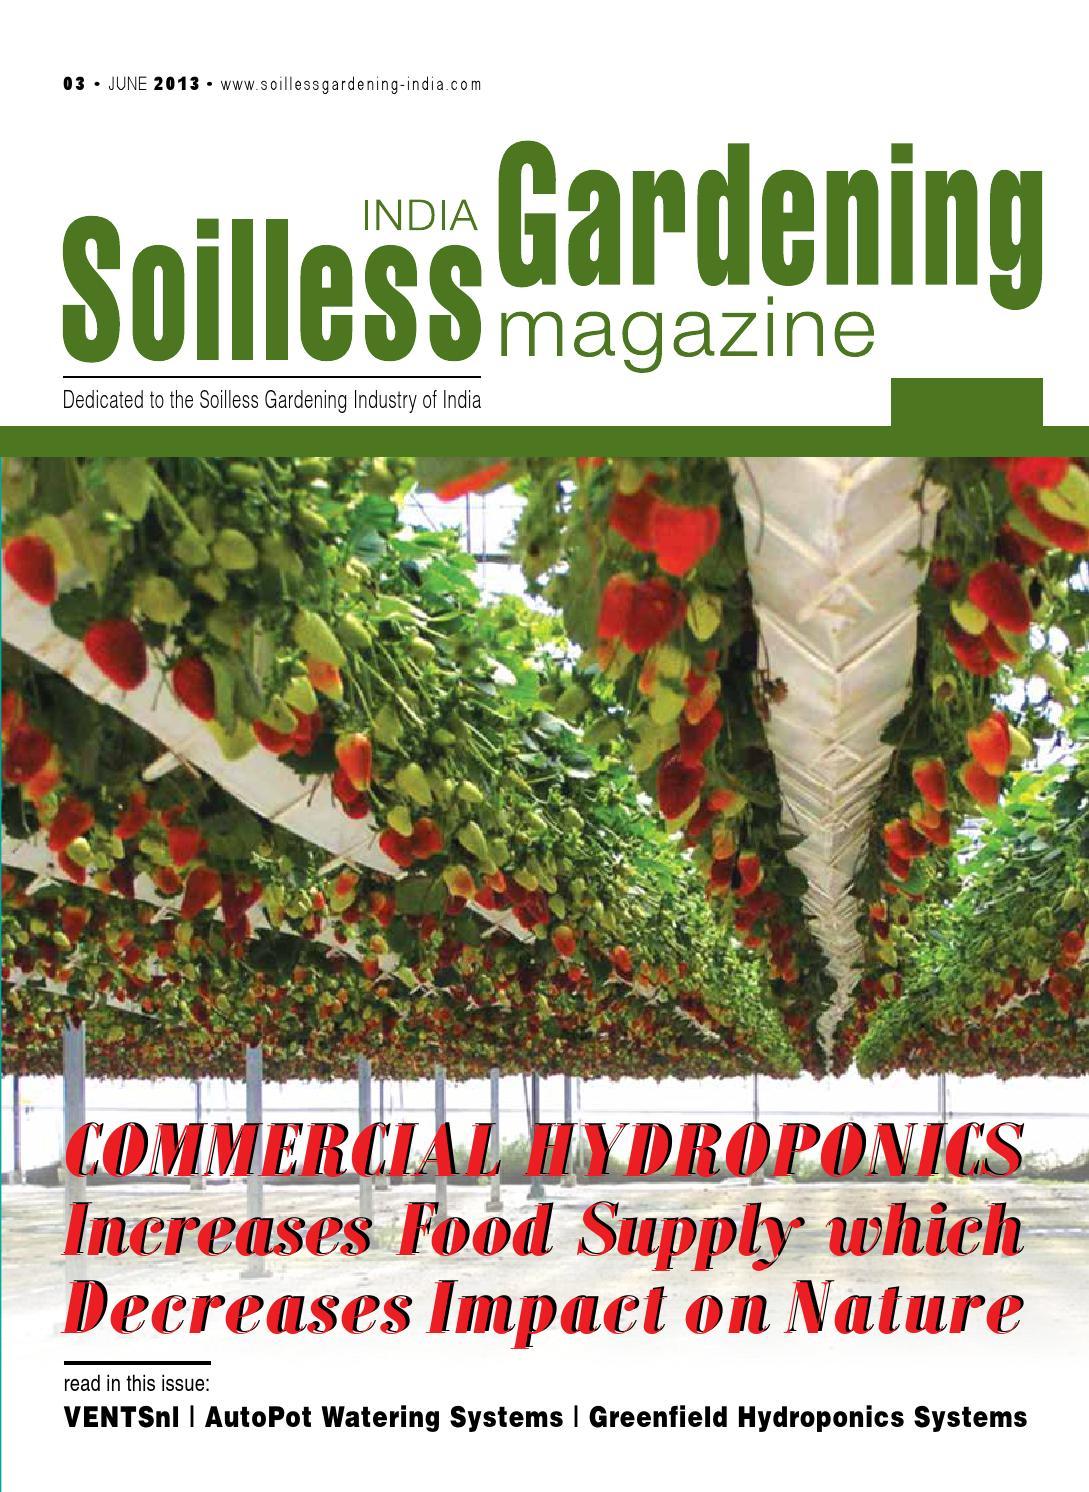 Soilless gardening 03 by aditya chaudhary issuu for Soil less farming